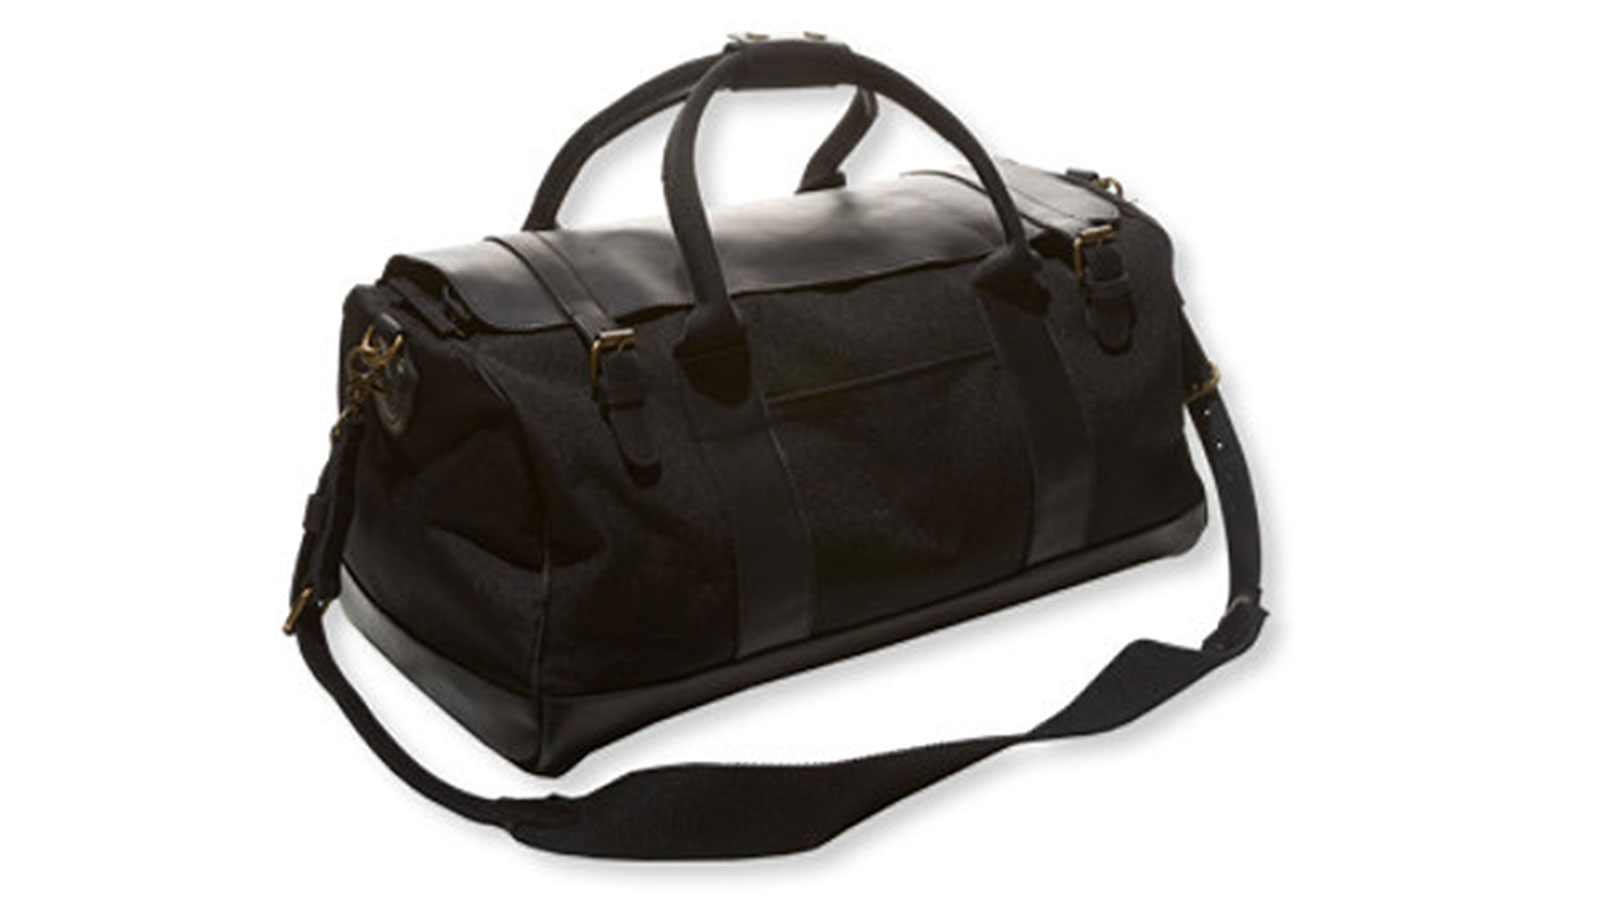 L.L. Bean Signature West Branch Weekender Duffel Bag | the best weekender bags for men